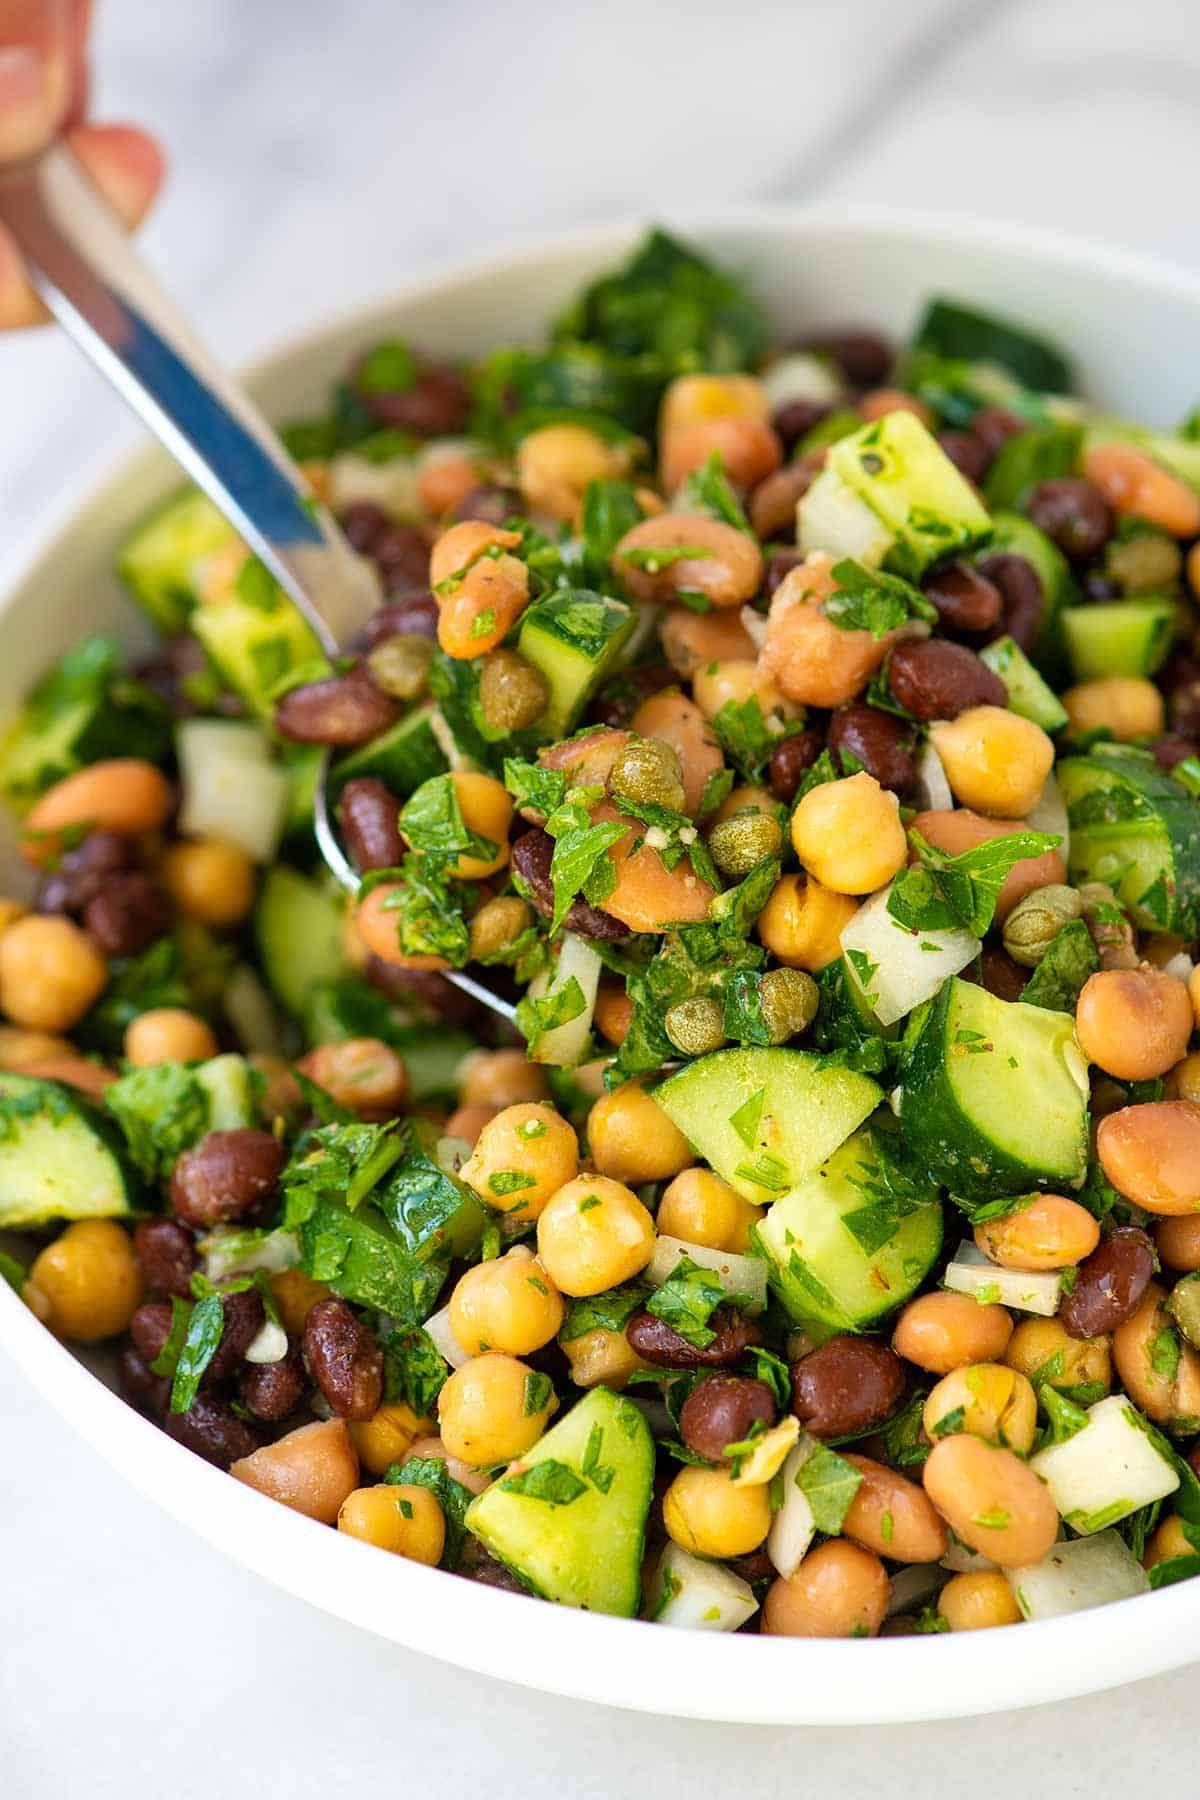 Ridiculously Easy Bean Salad Recipe In 2020 Bean Salad Vegan Bean Salad Salmon Recipes Baked Easy